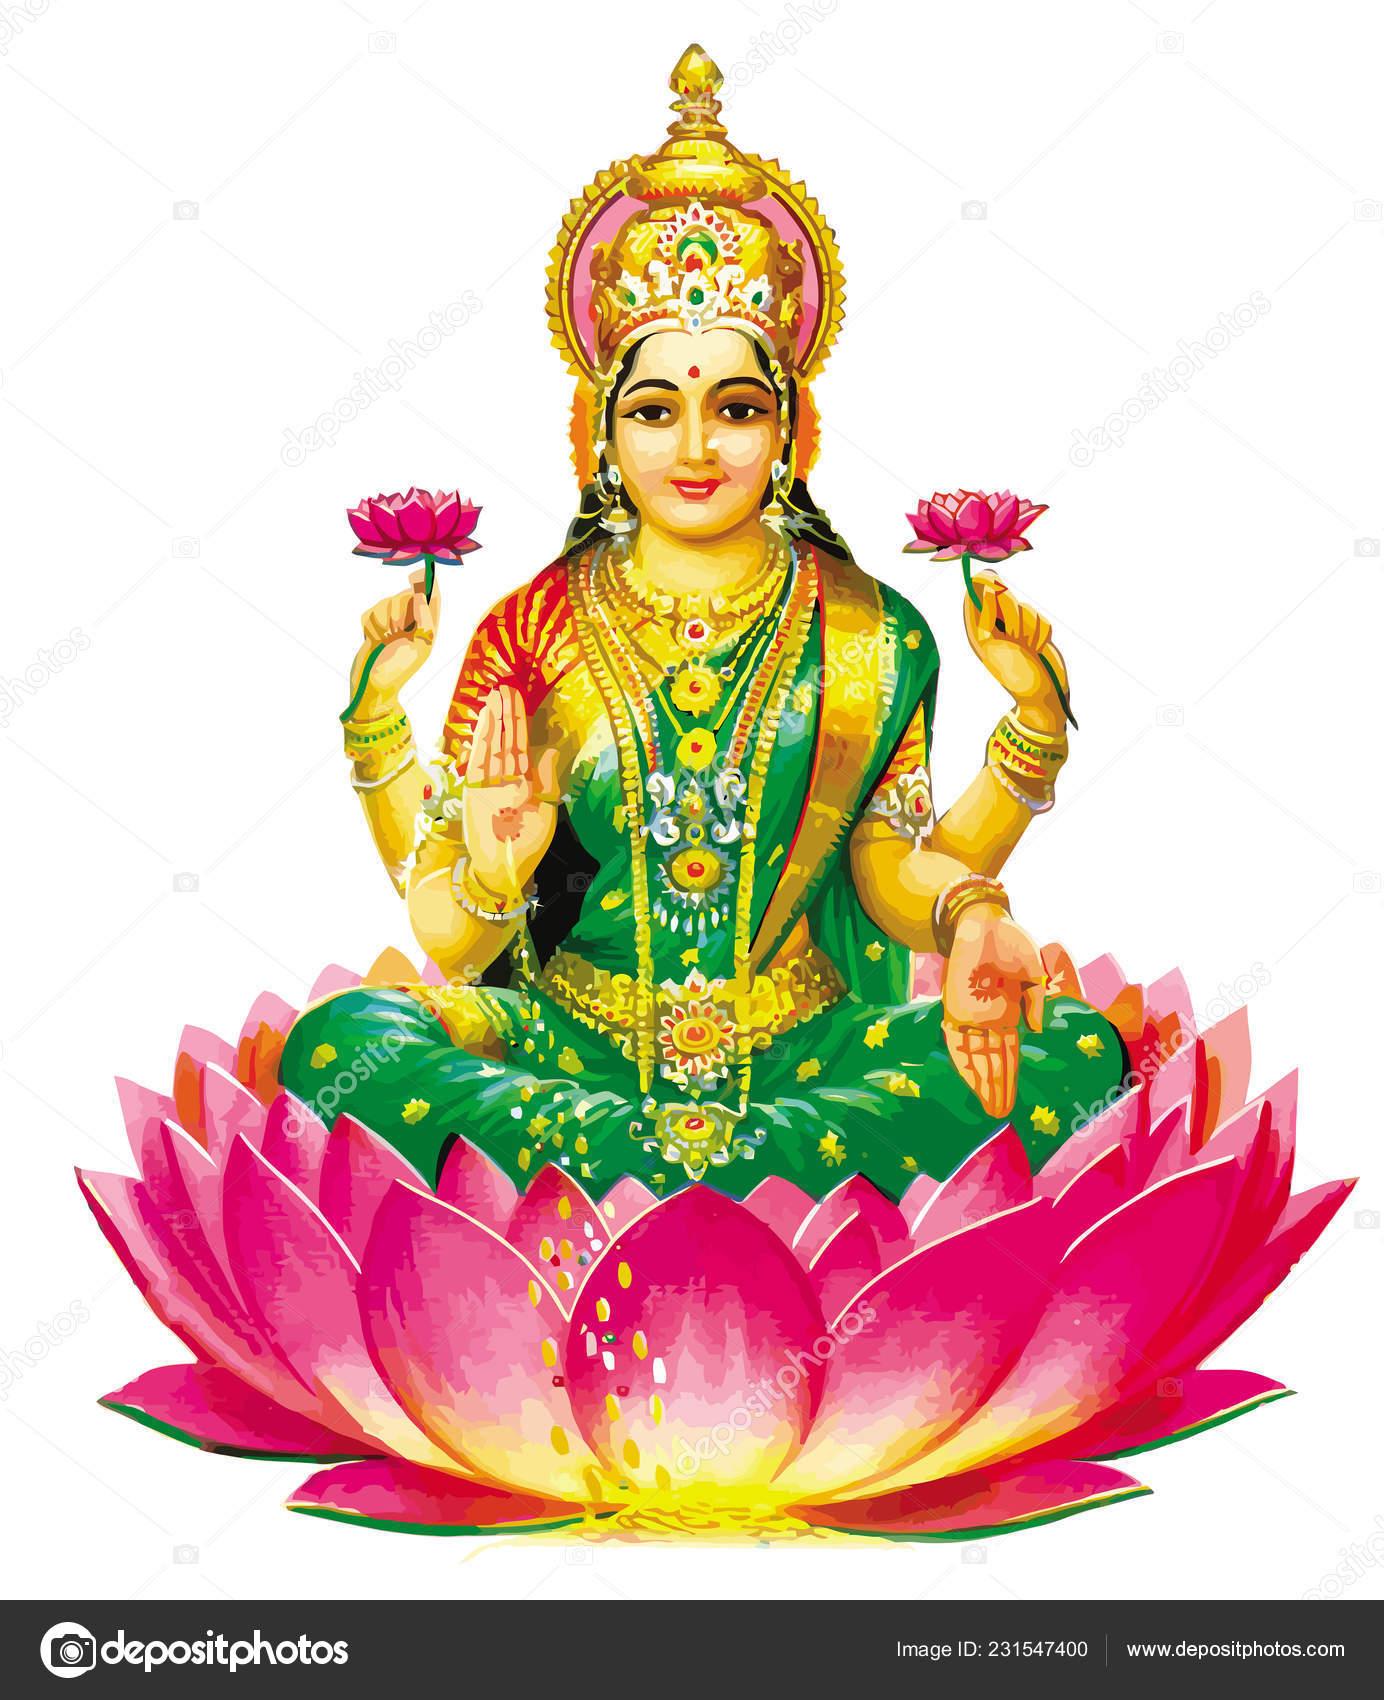 Flower Lotus Hindu Lord Faith Maha Shivaratri Mythology Illustration